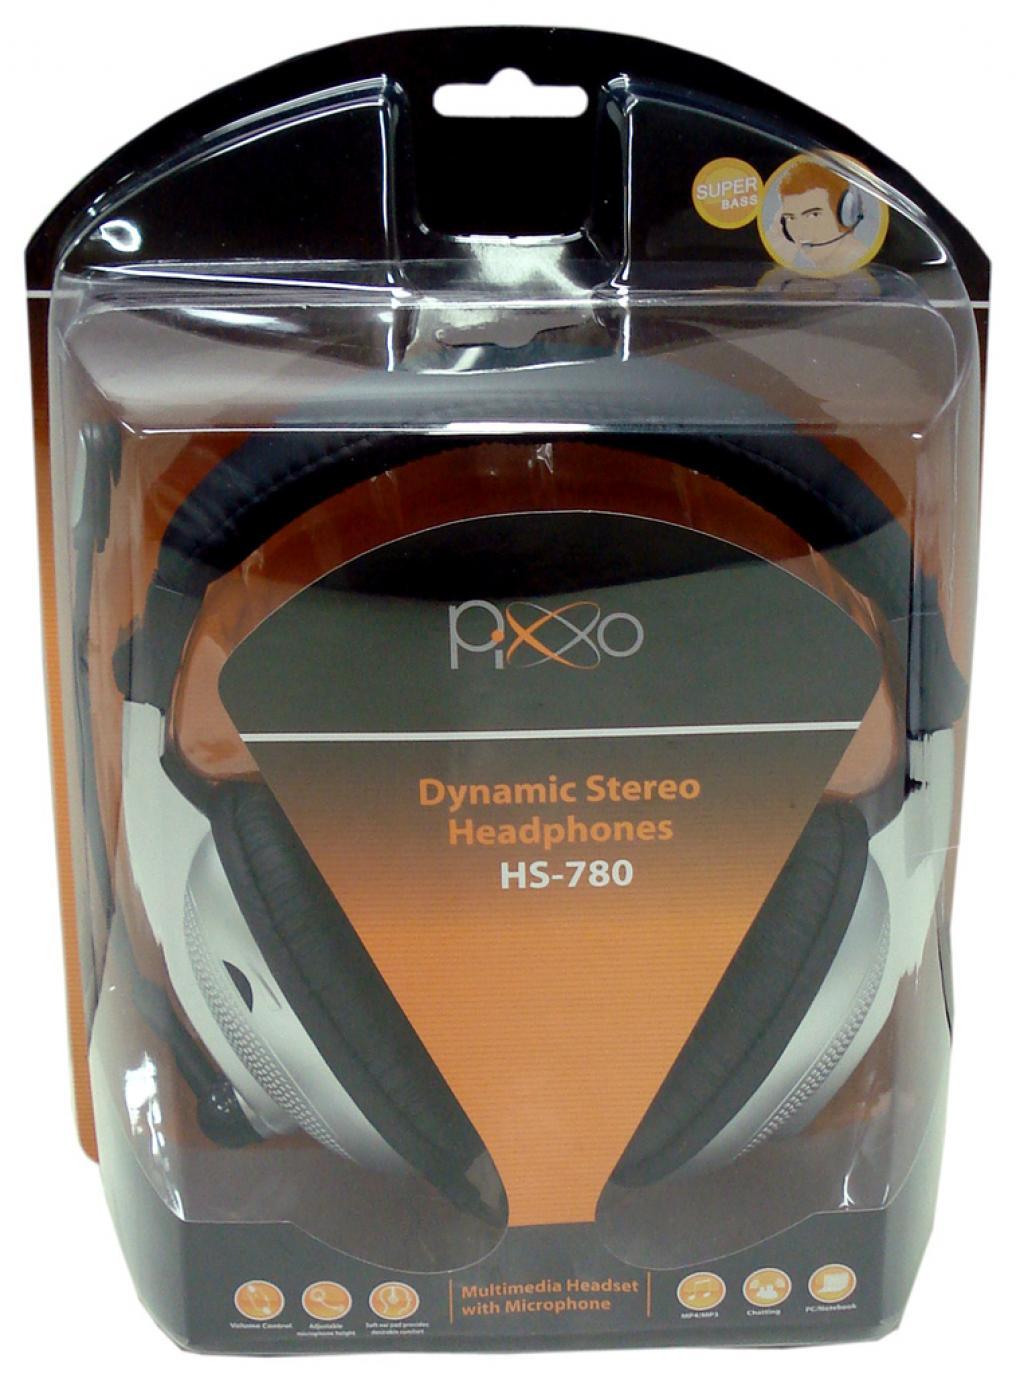 HEADSET HS-780 PIXXO